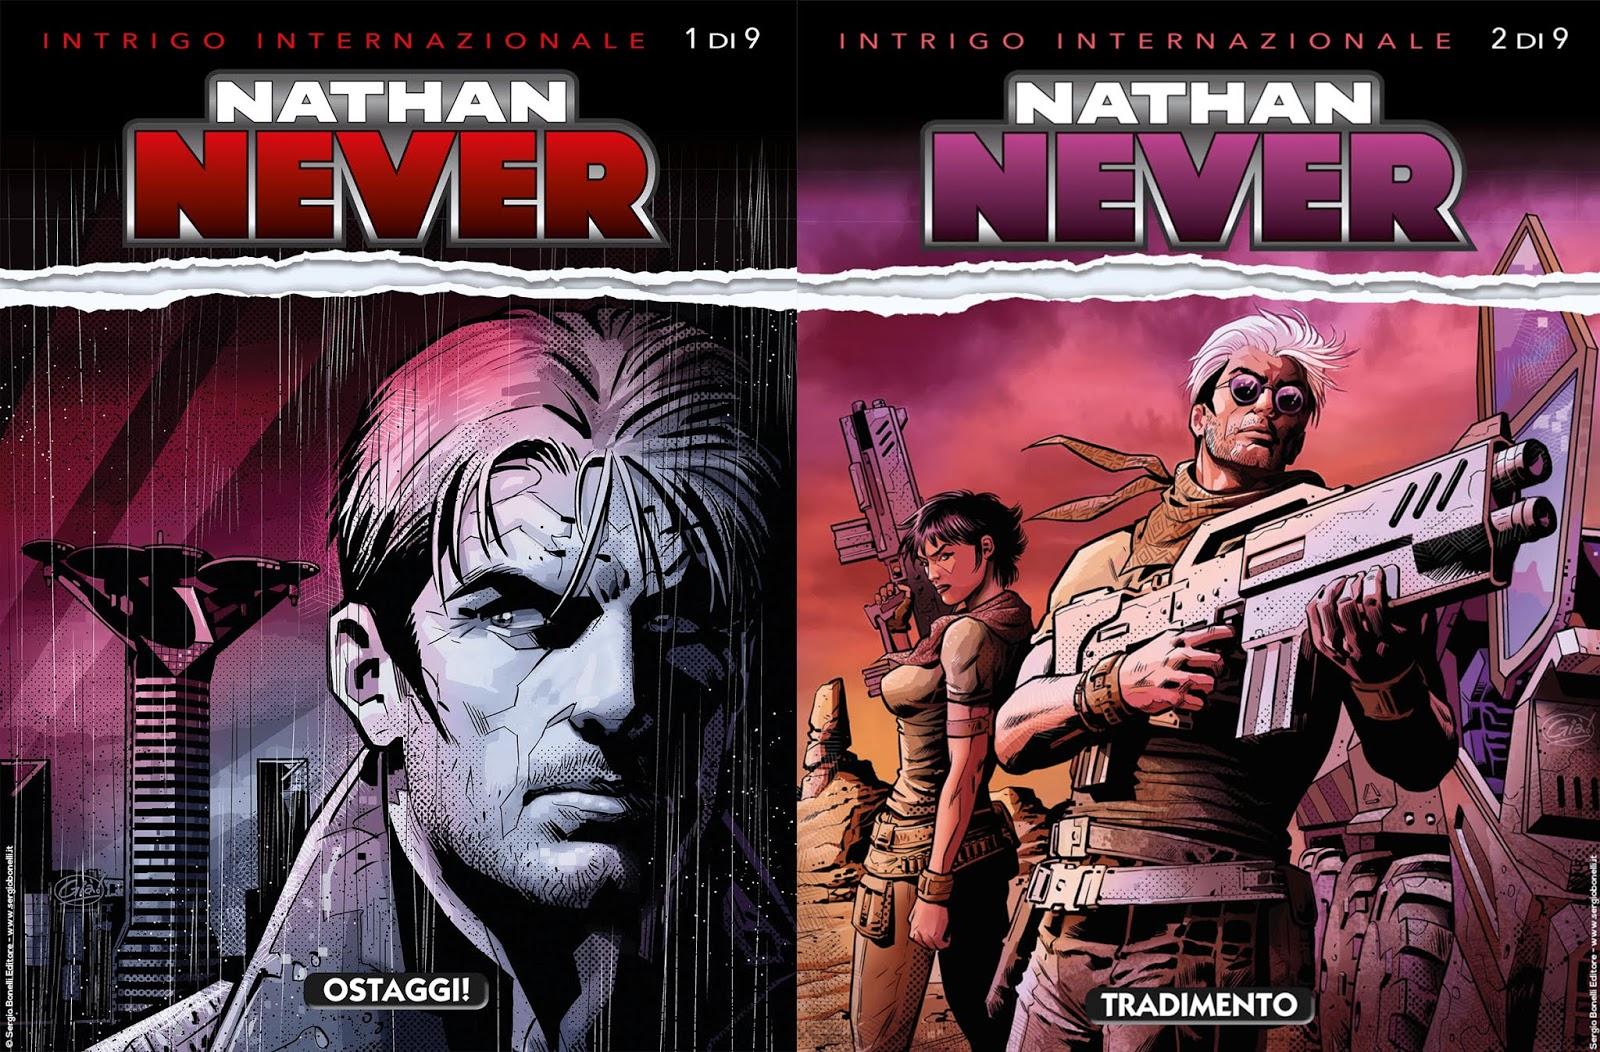 Nathan Never Intrigo internazionale